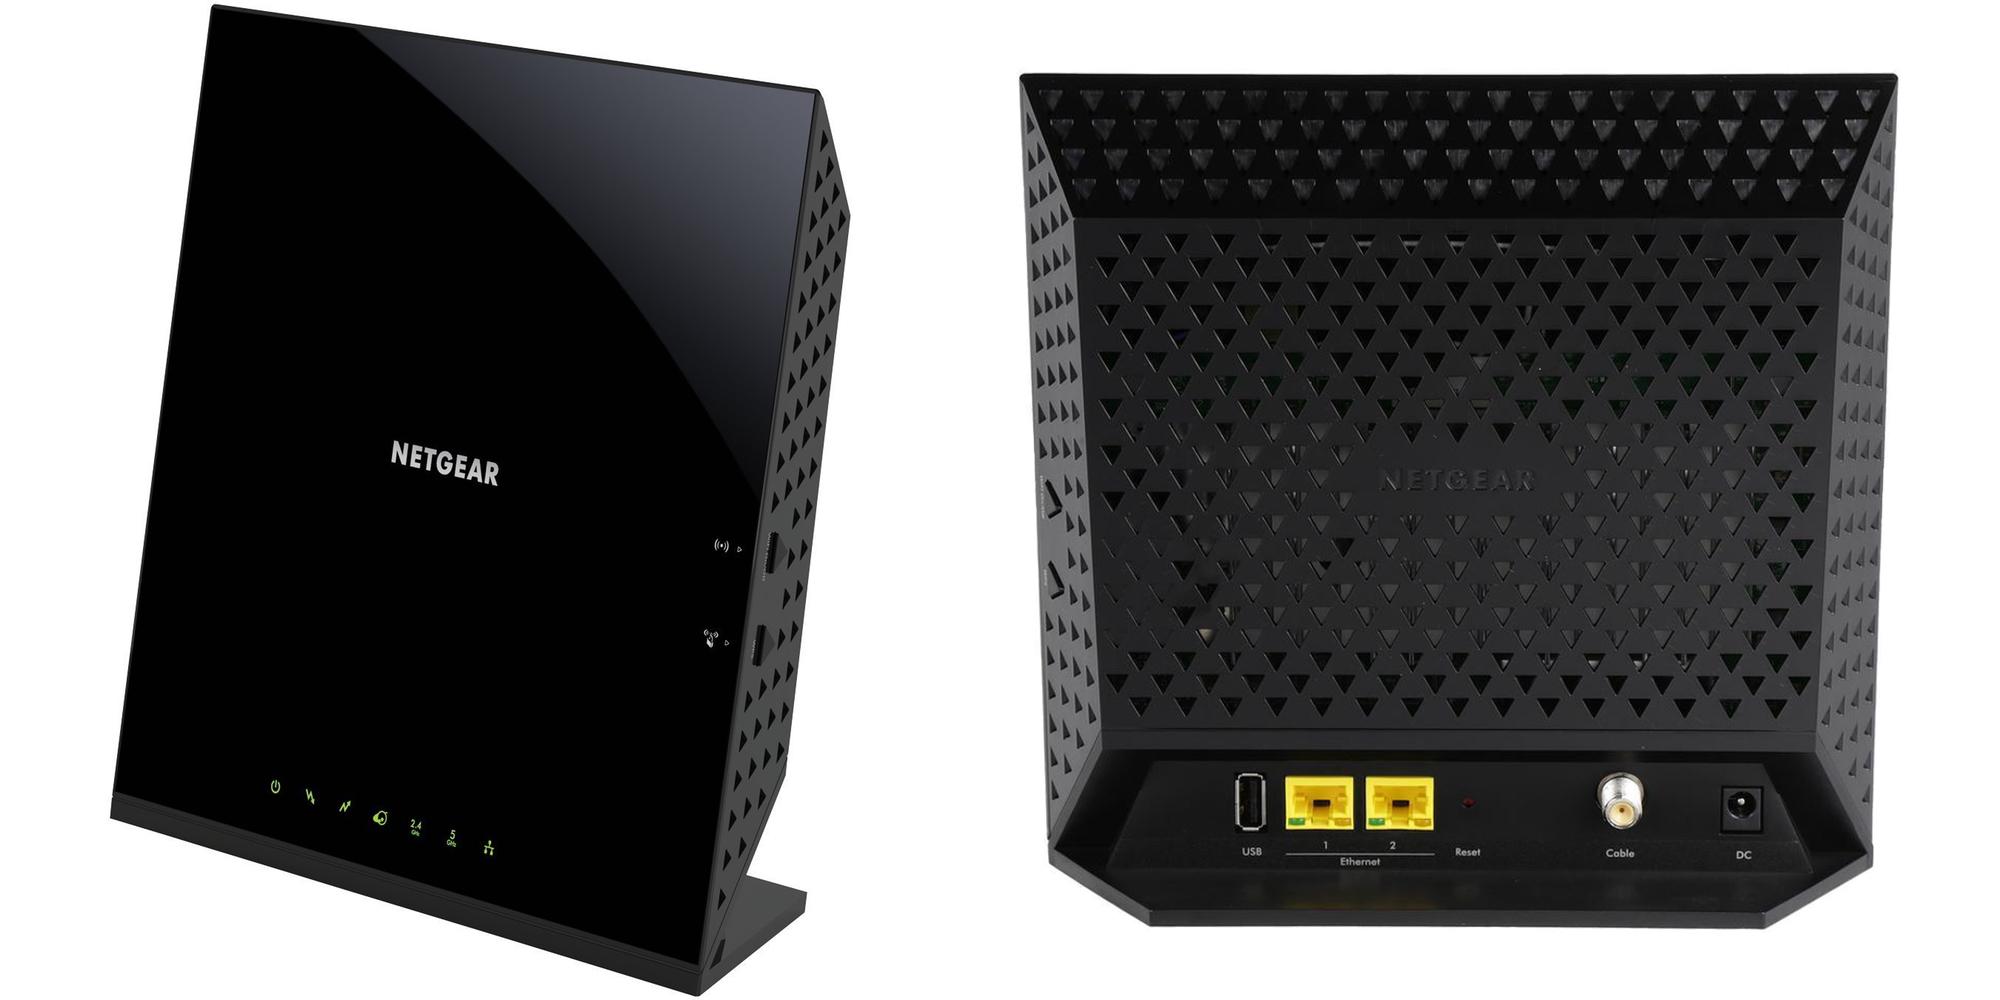 NETGEAR's 802.11ac Wi-Fi Router doubles as a DOCSIS 3.0 Modem: $119 (Reg. $150)